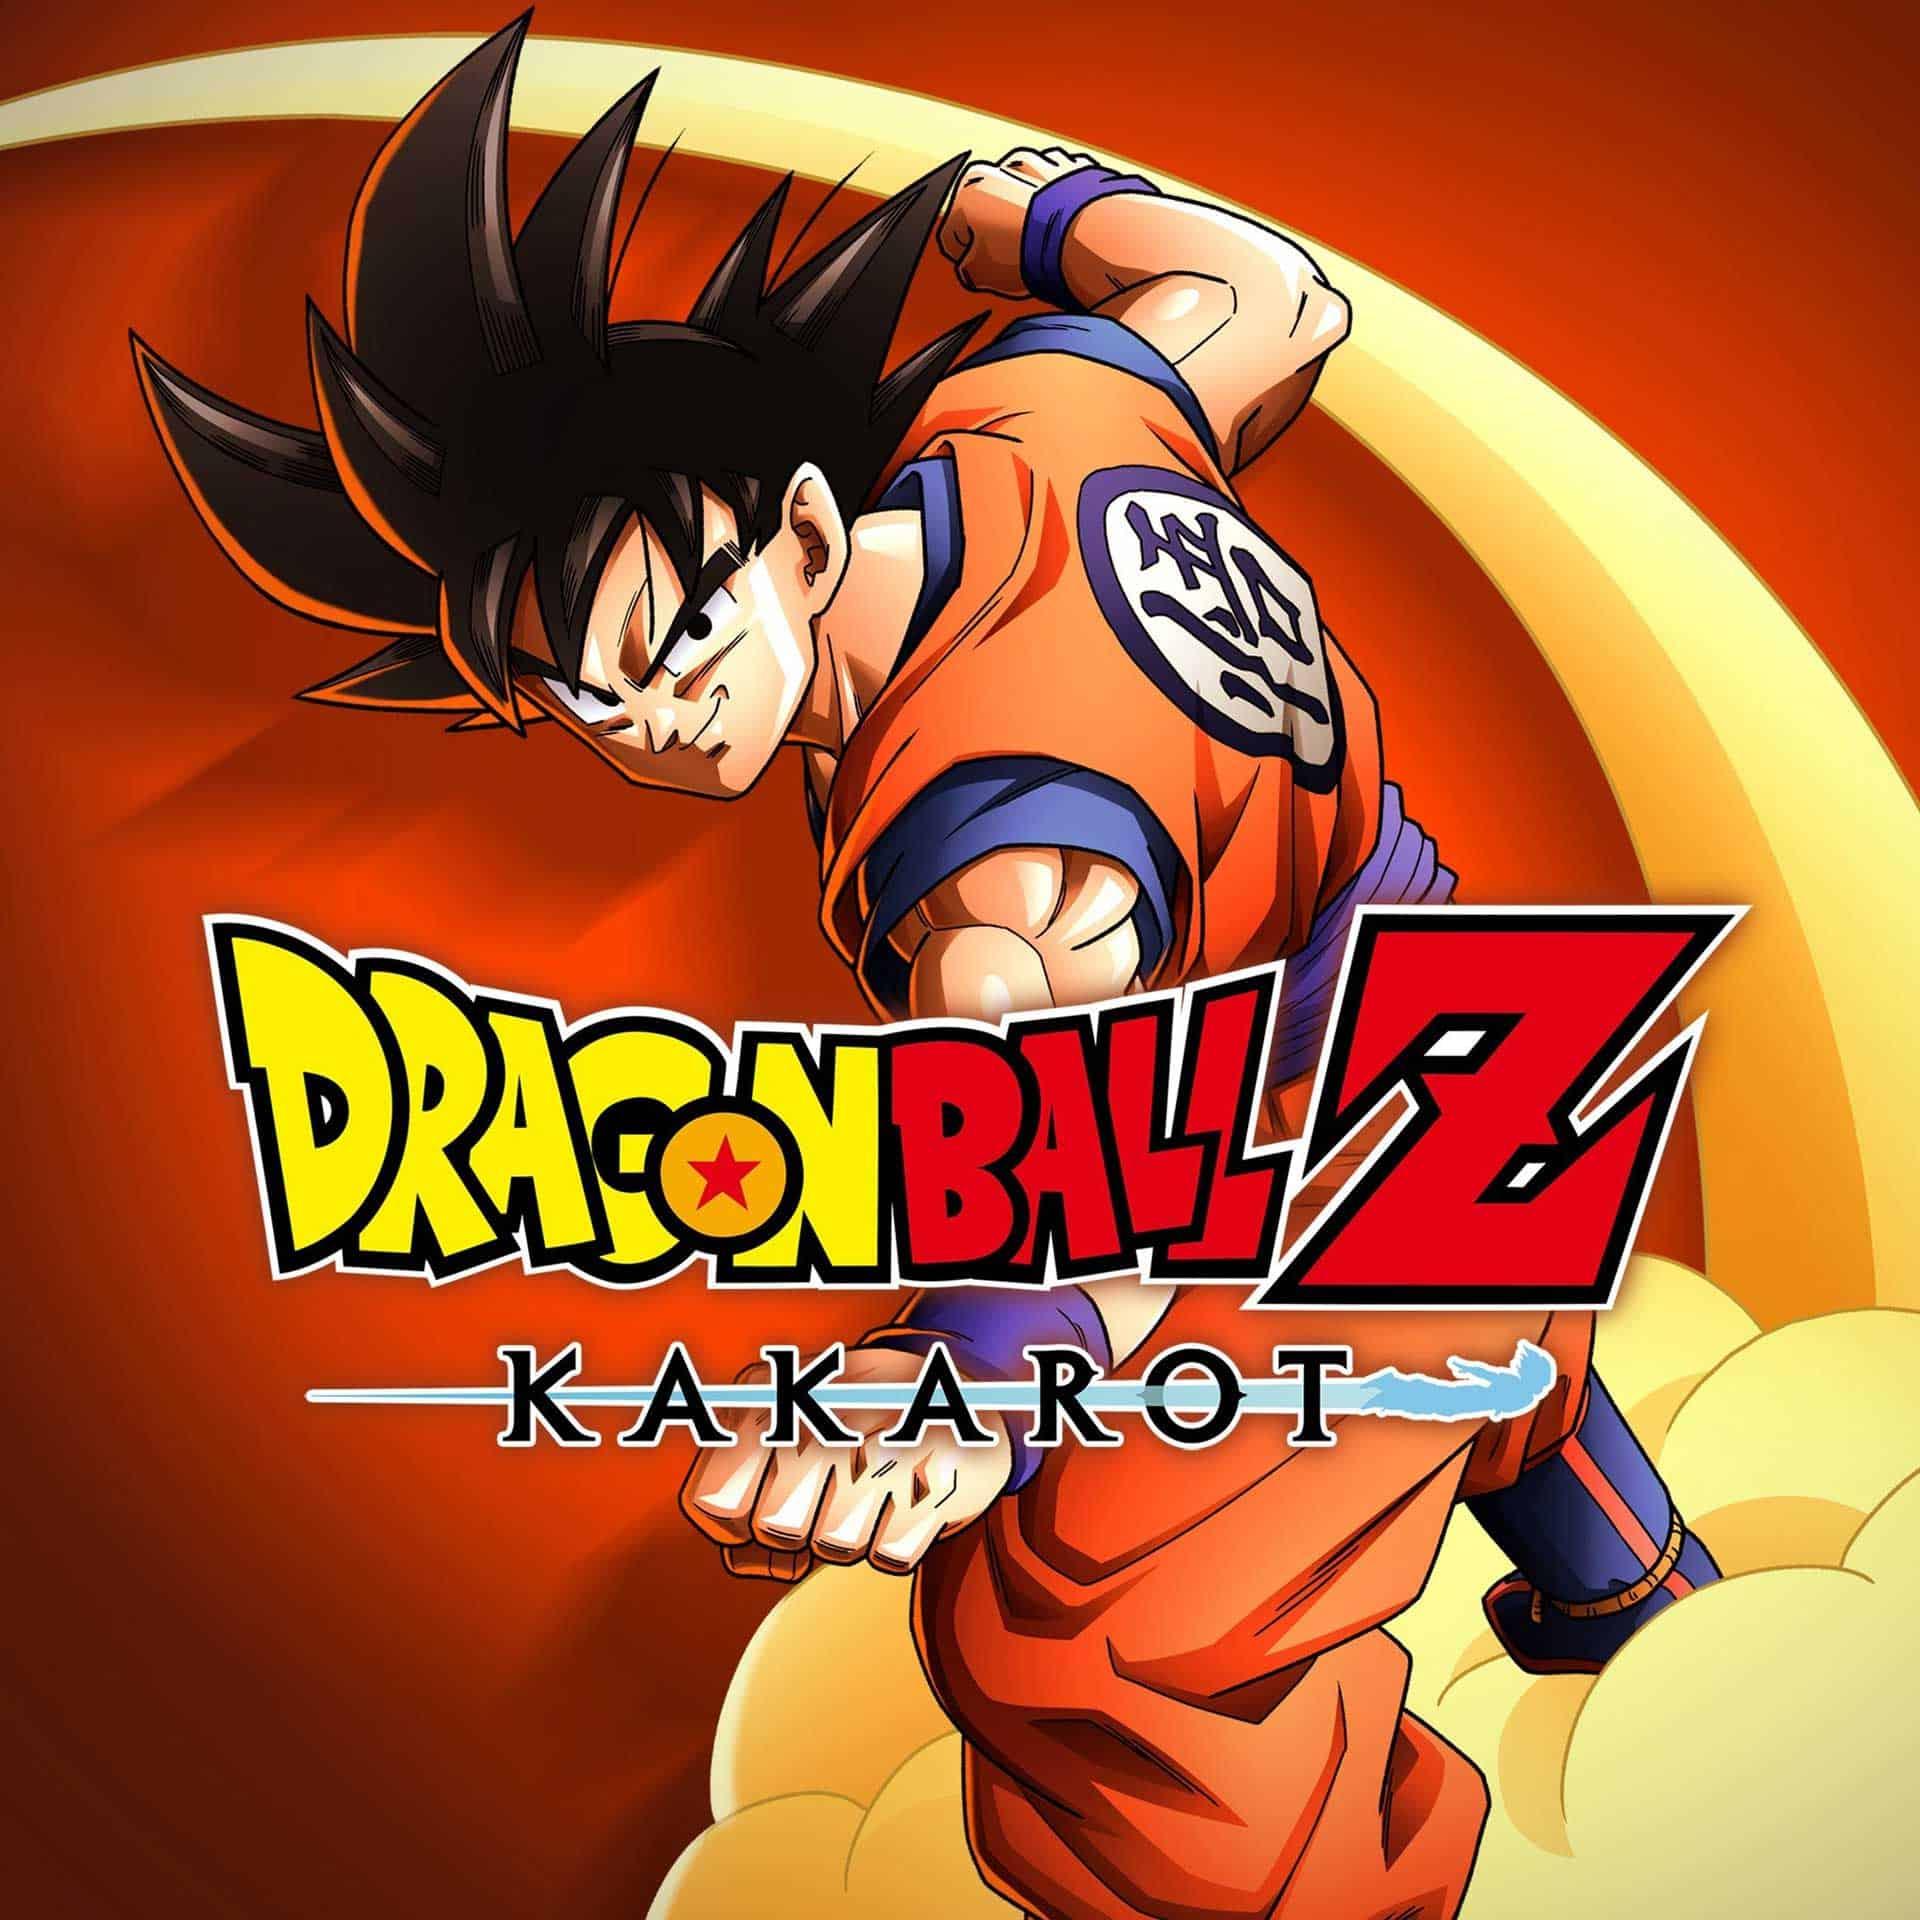 The Dragon Ball Z: Kakarot Day One Update